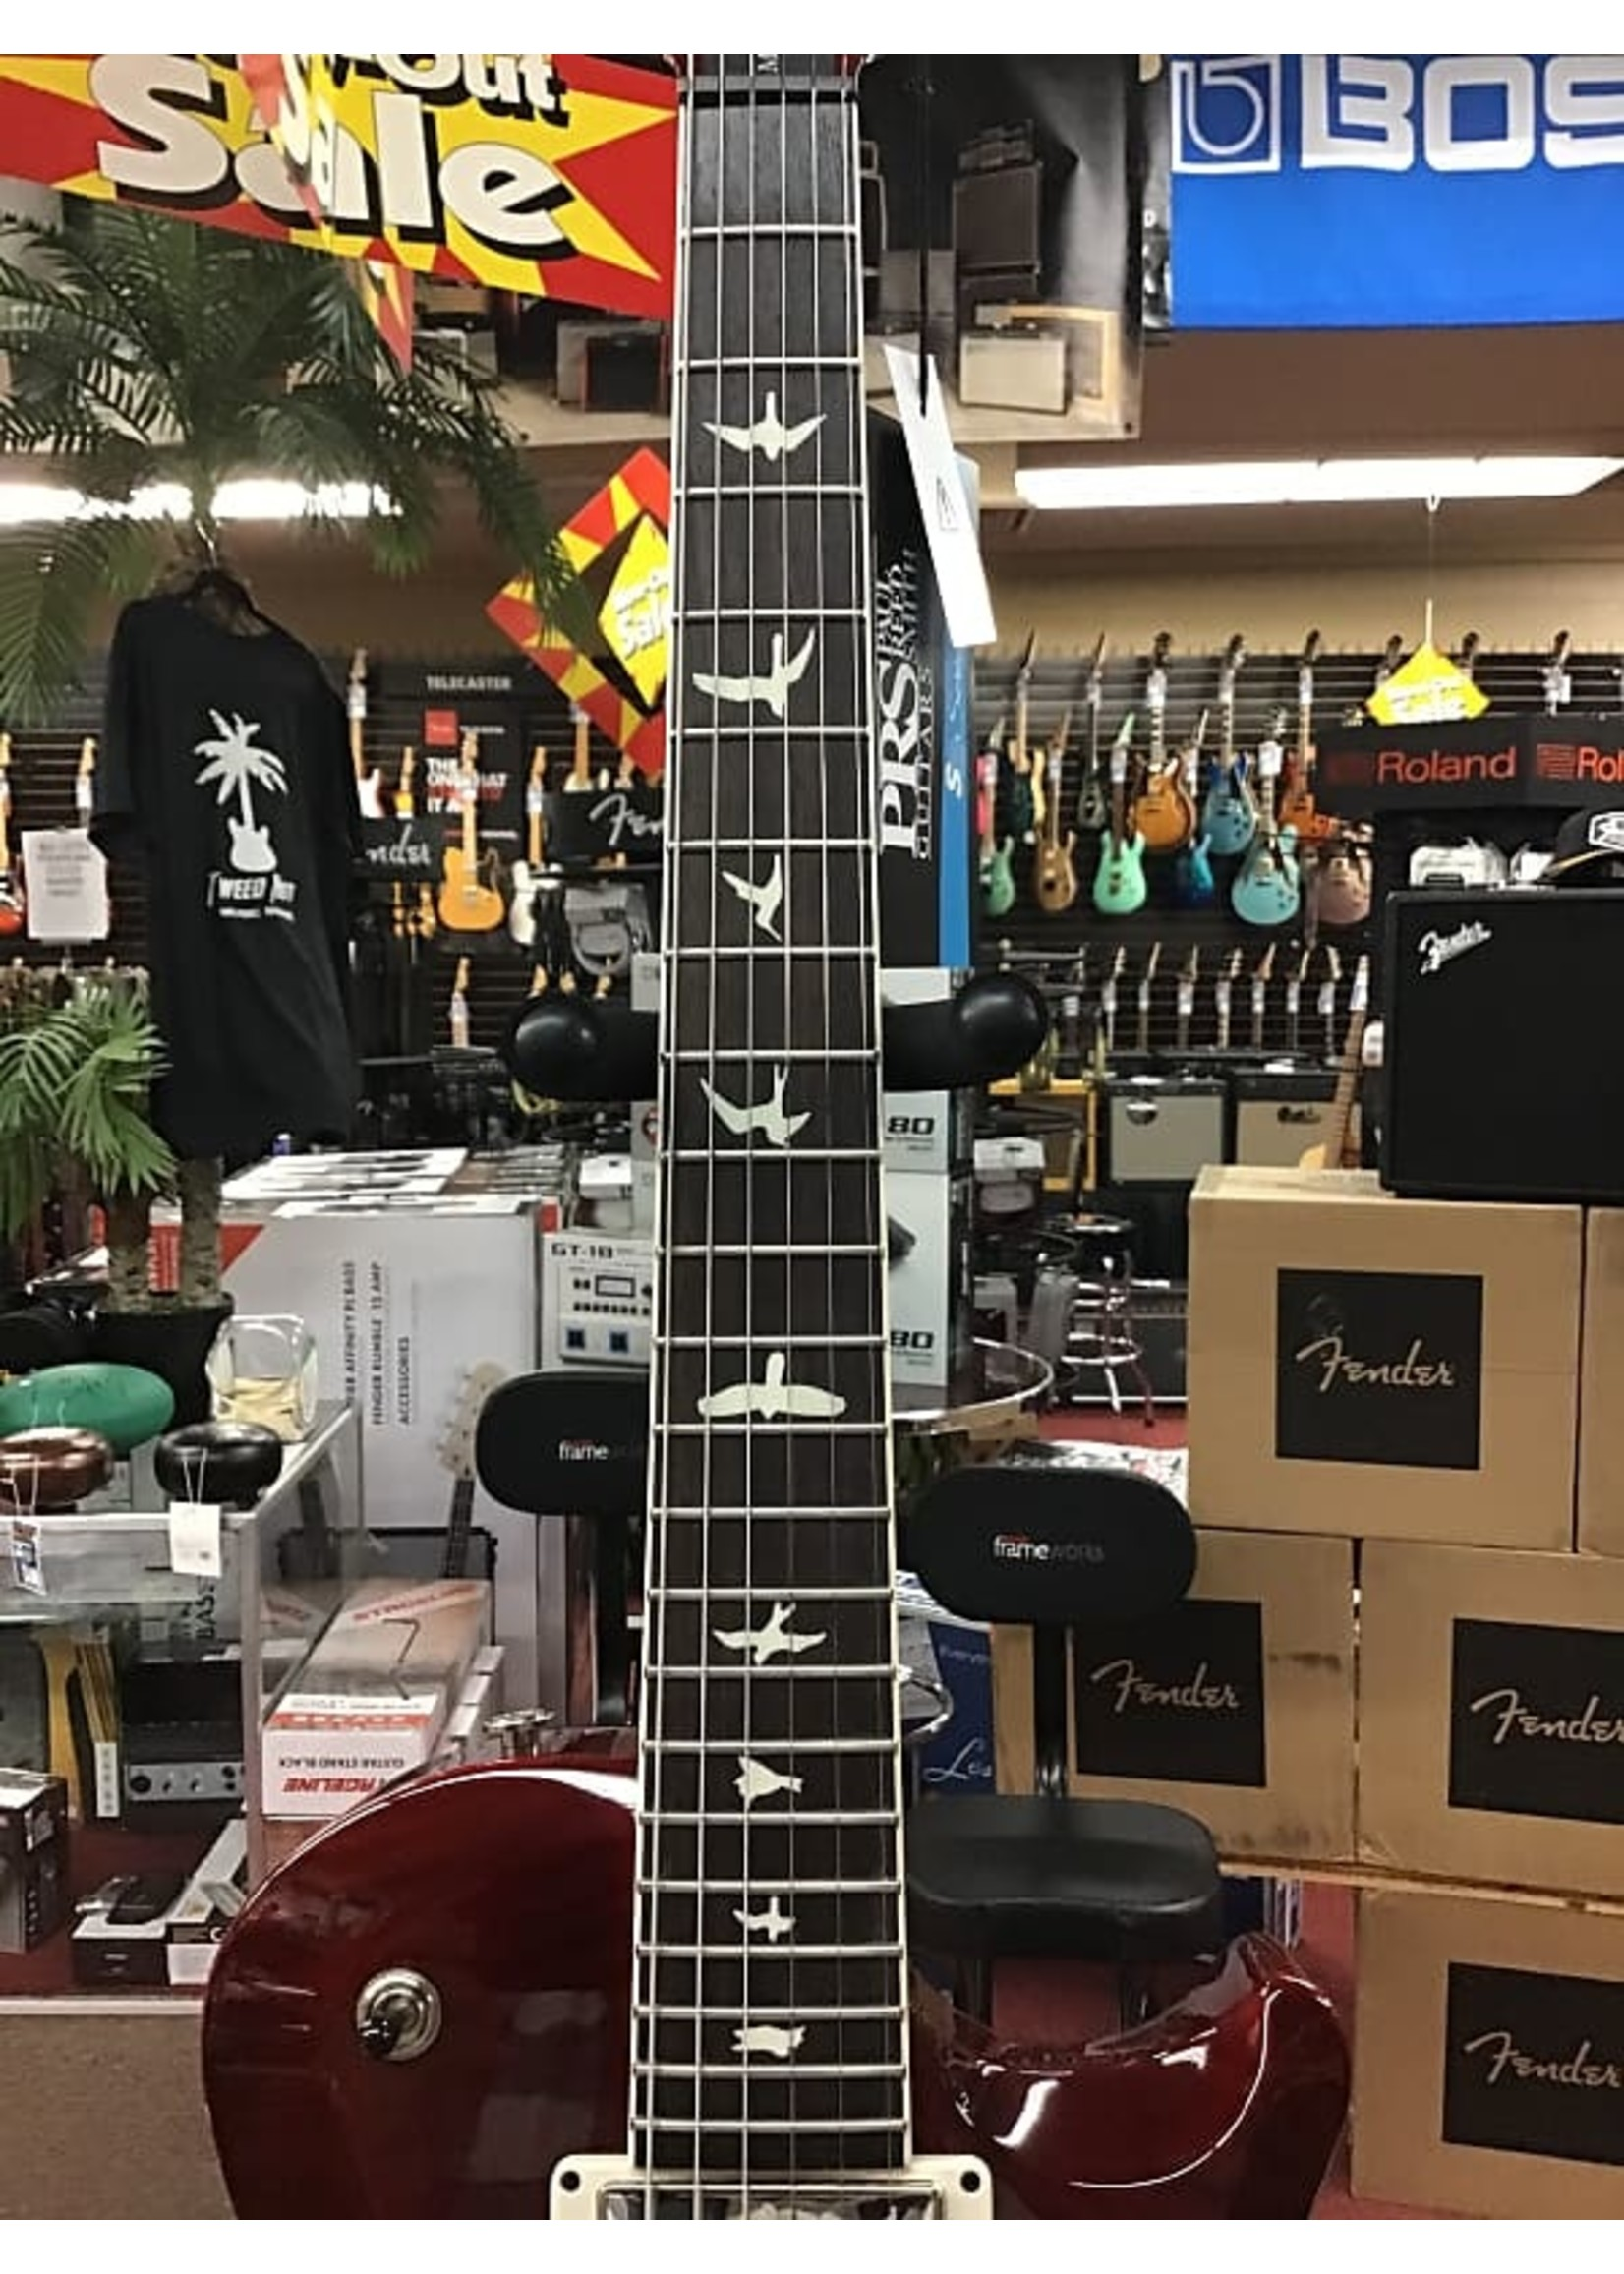 Paul Reed Smith PRS S2 McCarty 594 Singlecut Electric Guitar - Dark Cherry Sunburst